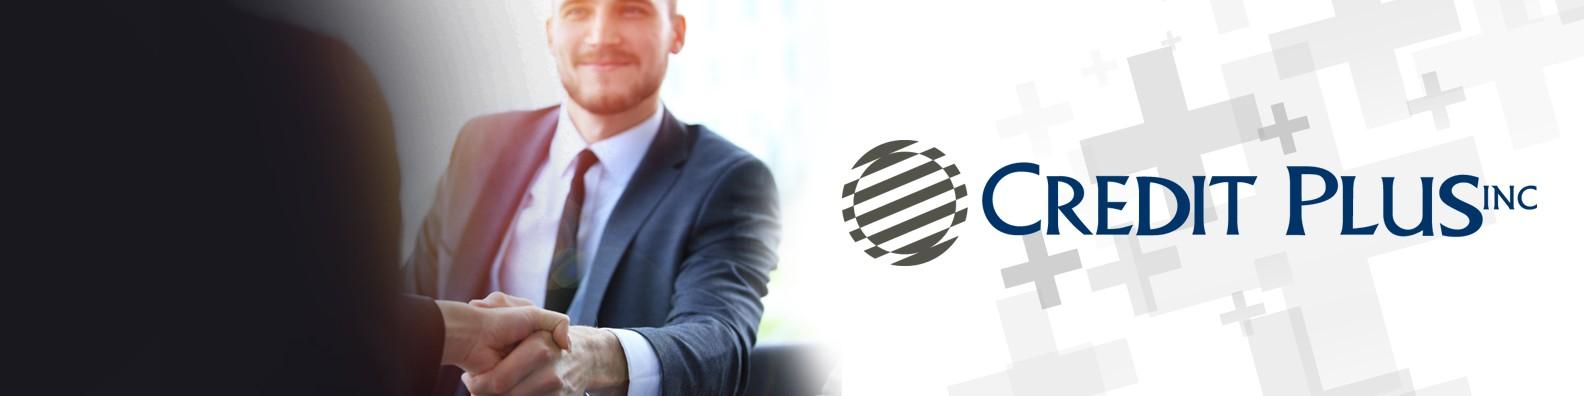 Credit Plus Mortgage Verifications LinkedIn